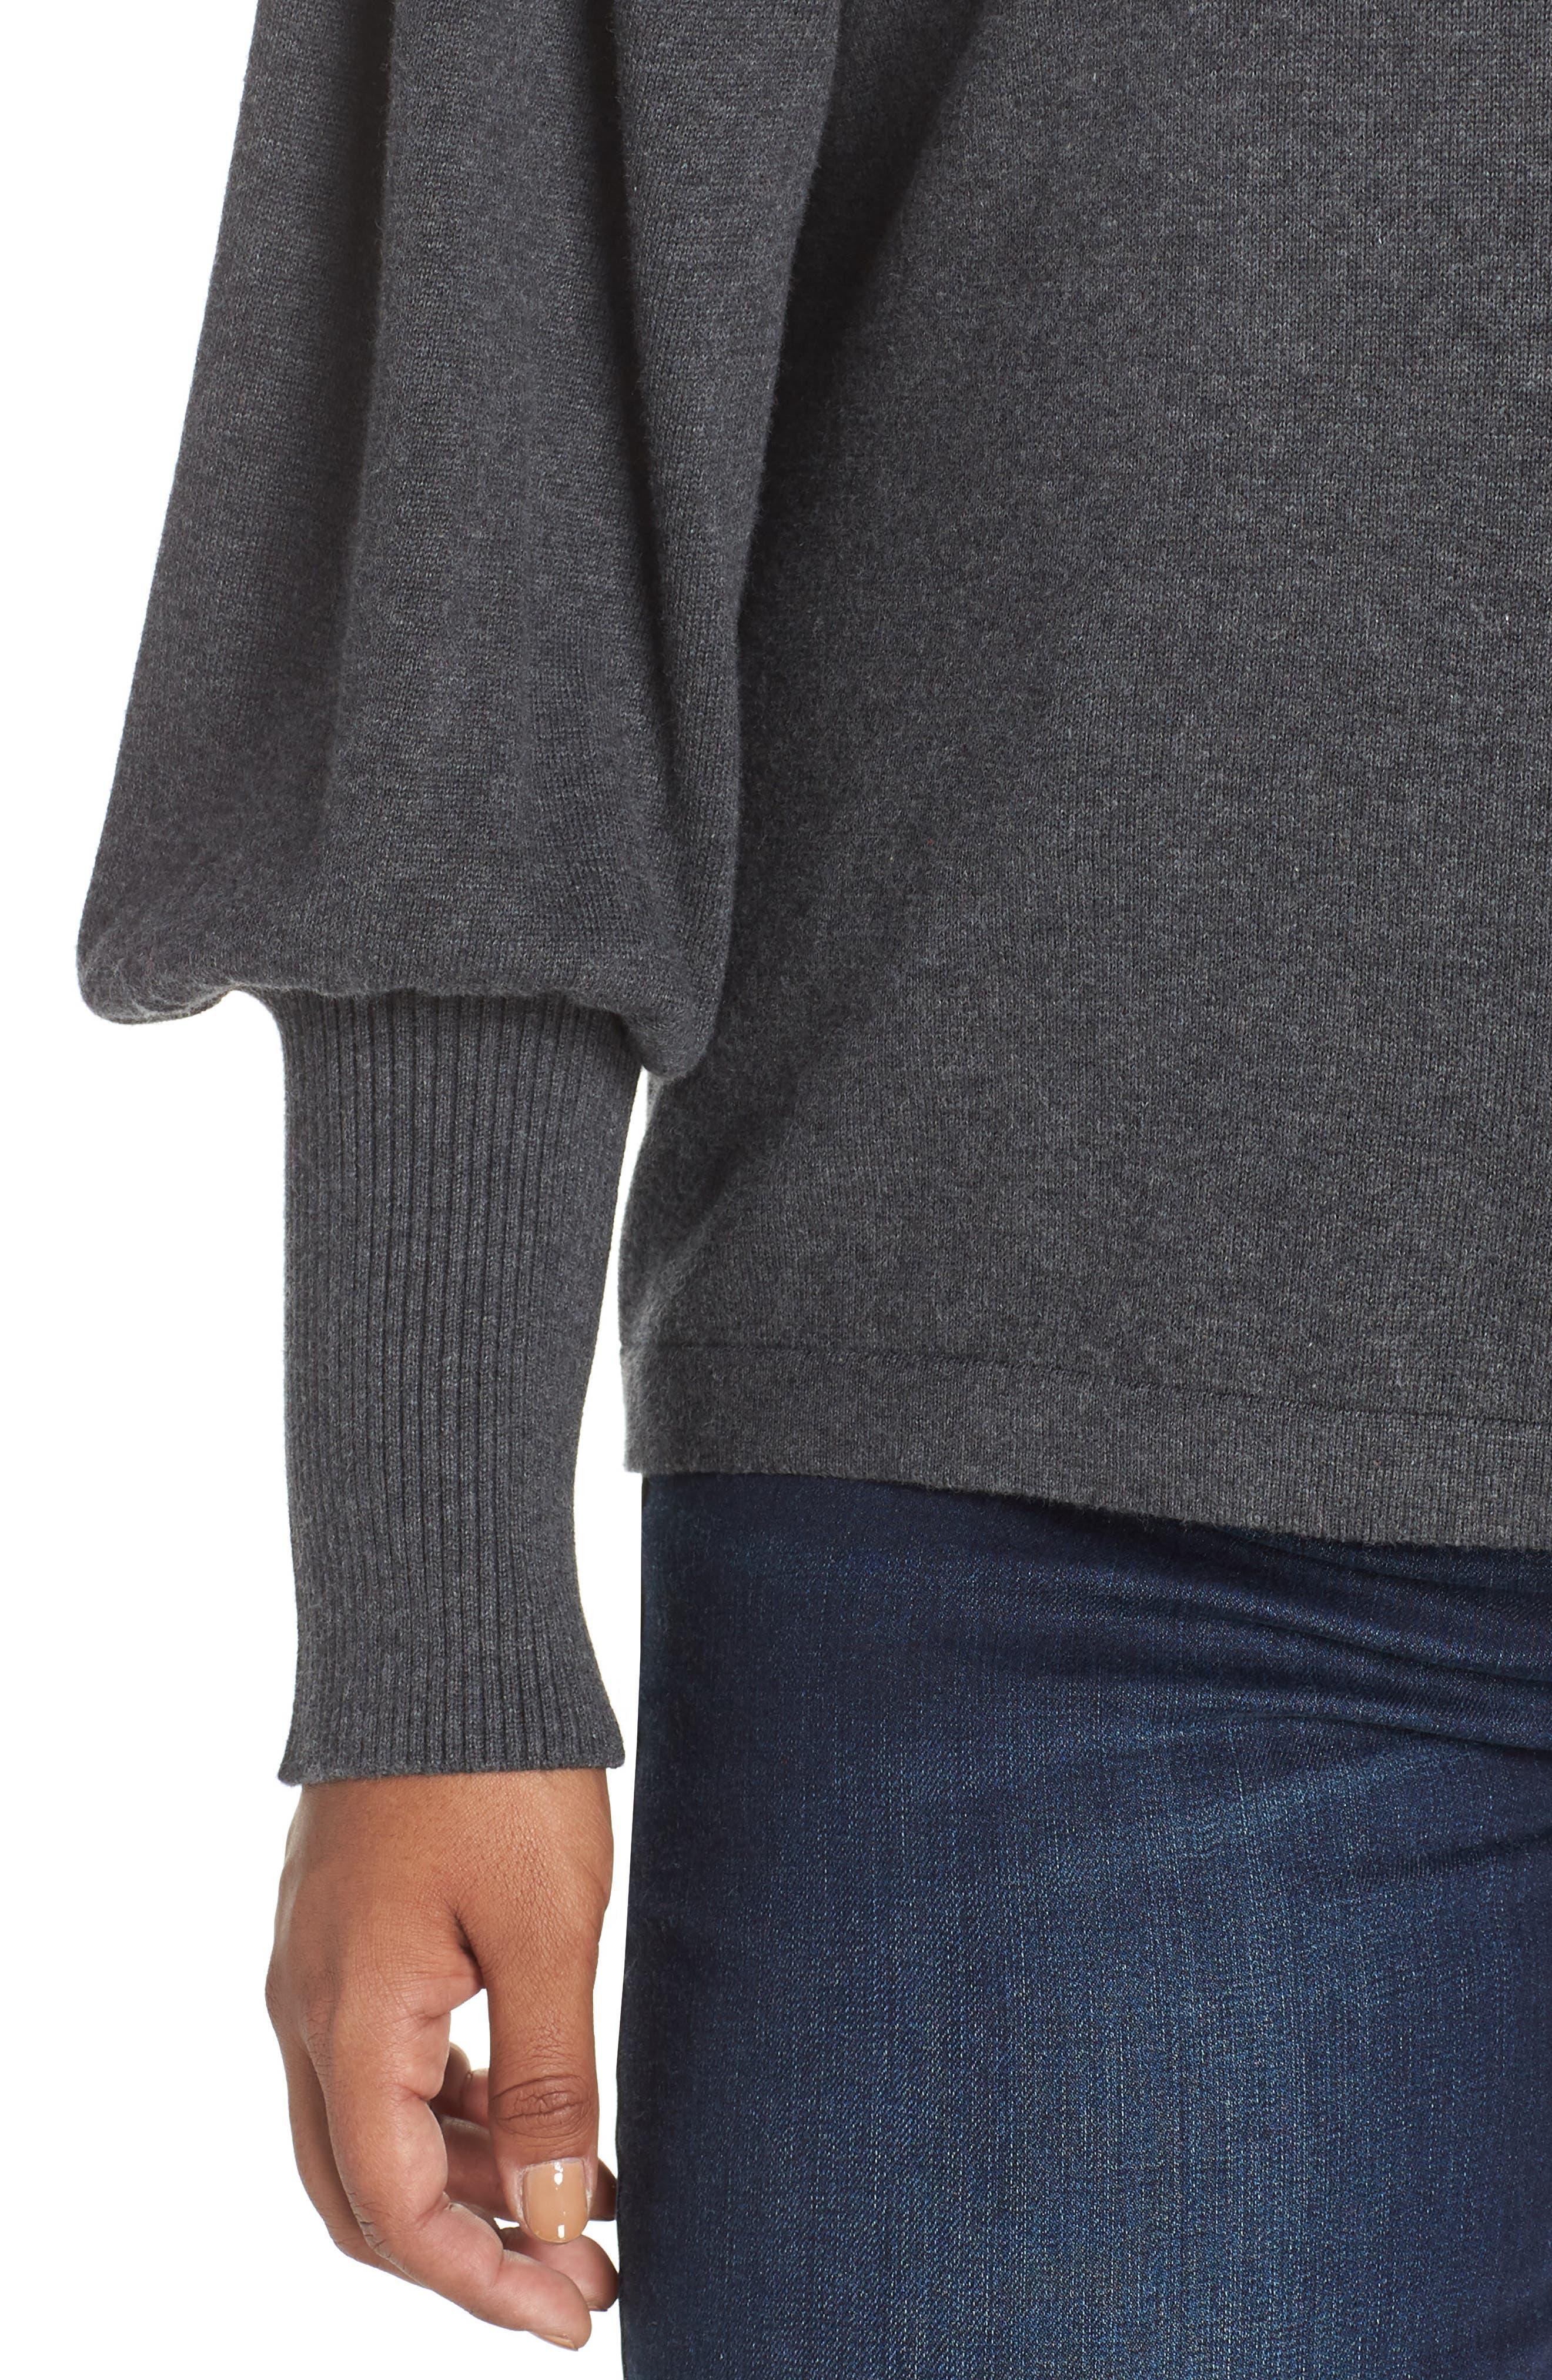 Blouson Sleeve Sweater,                             Alternate thumbnail 6, color,                             MED HEATHER GREY